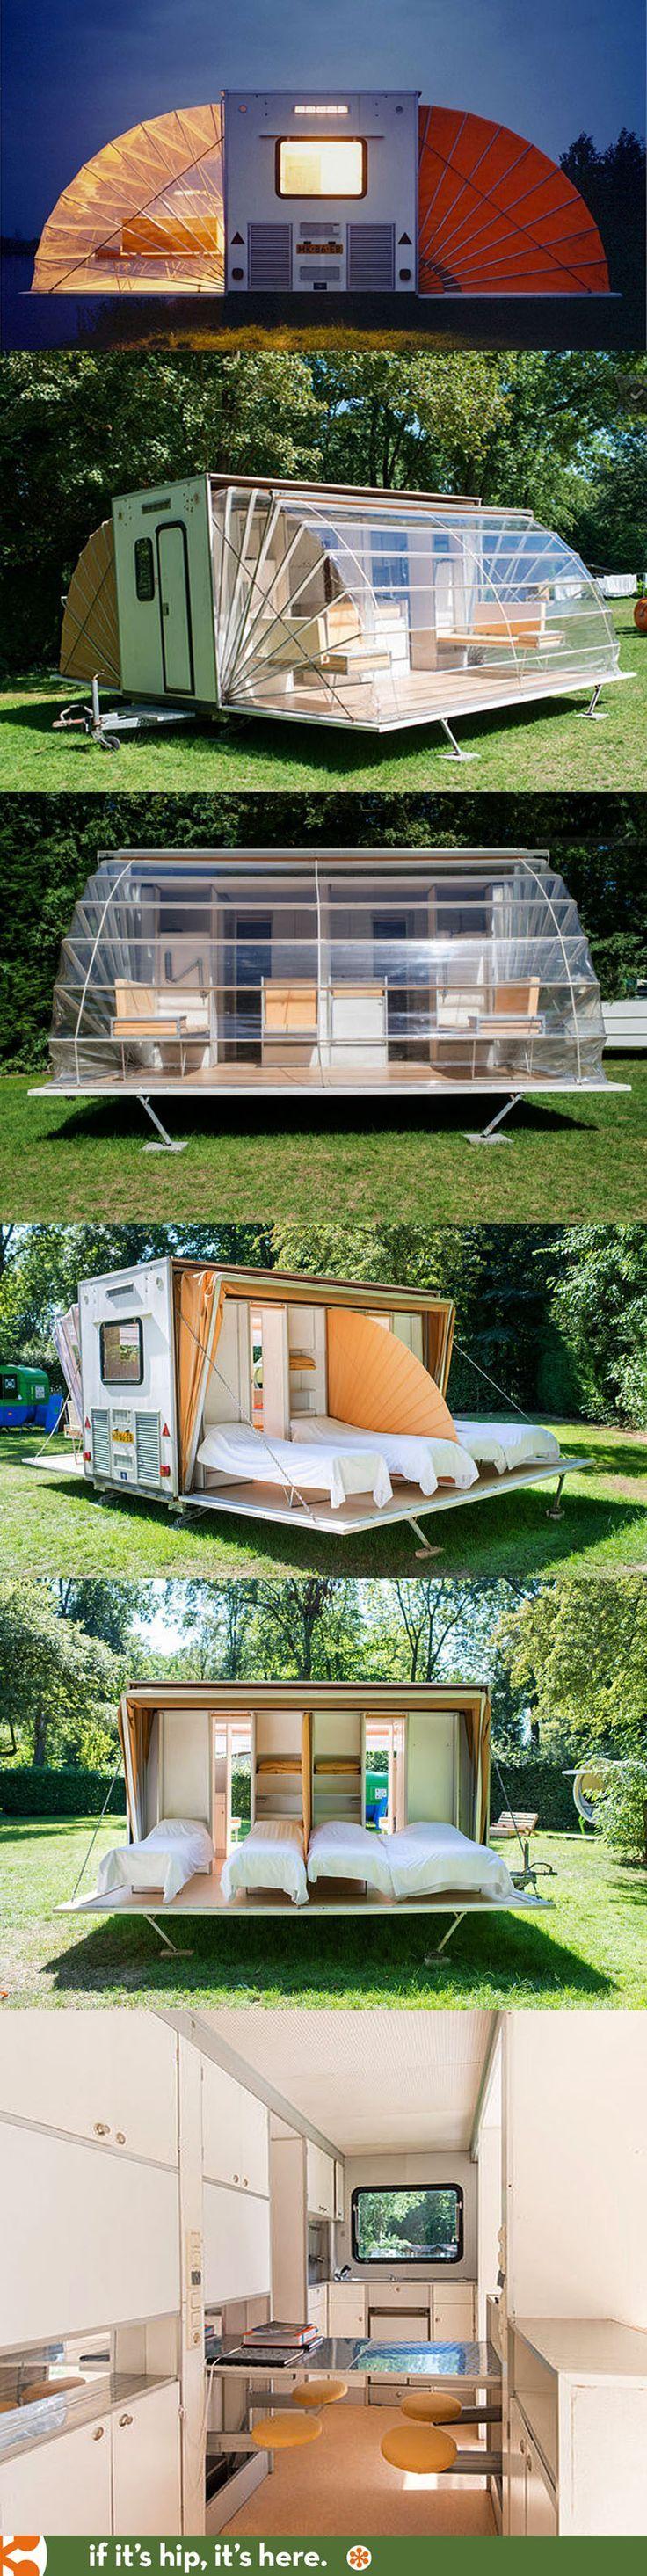 If It's Hip, It's Here: The Urban Campsite's Coolest Caravan, The Marquis by Eduard Bohtlingk. Good.